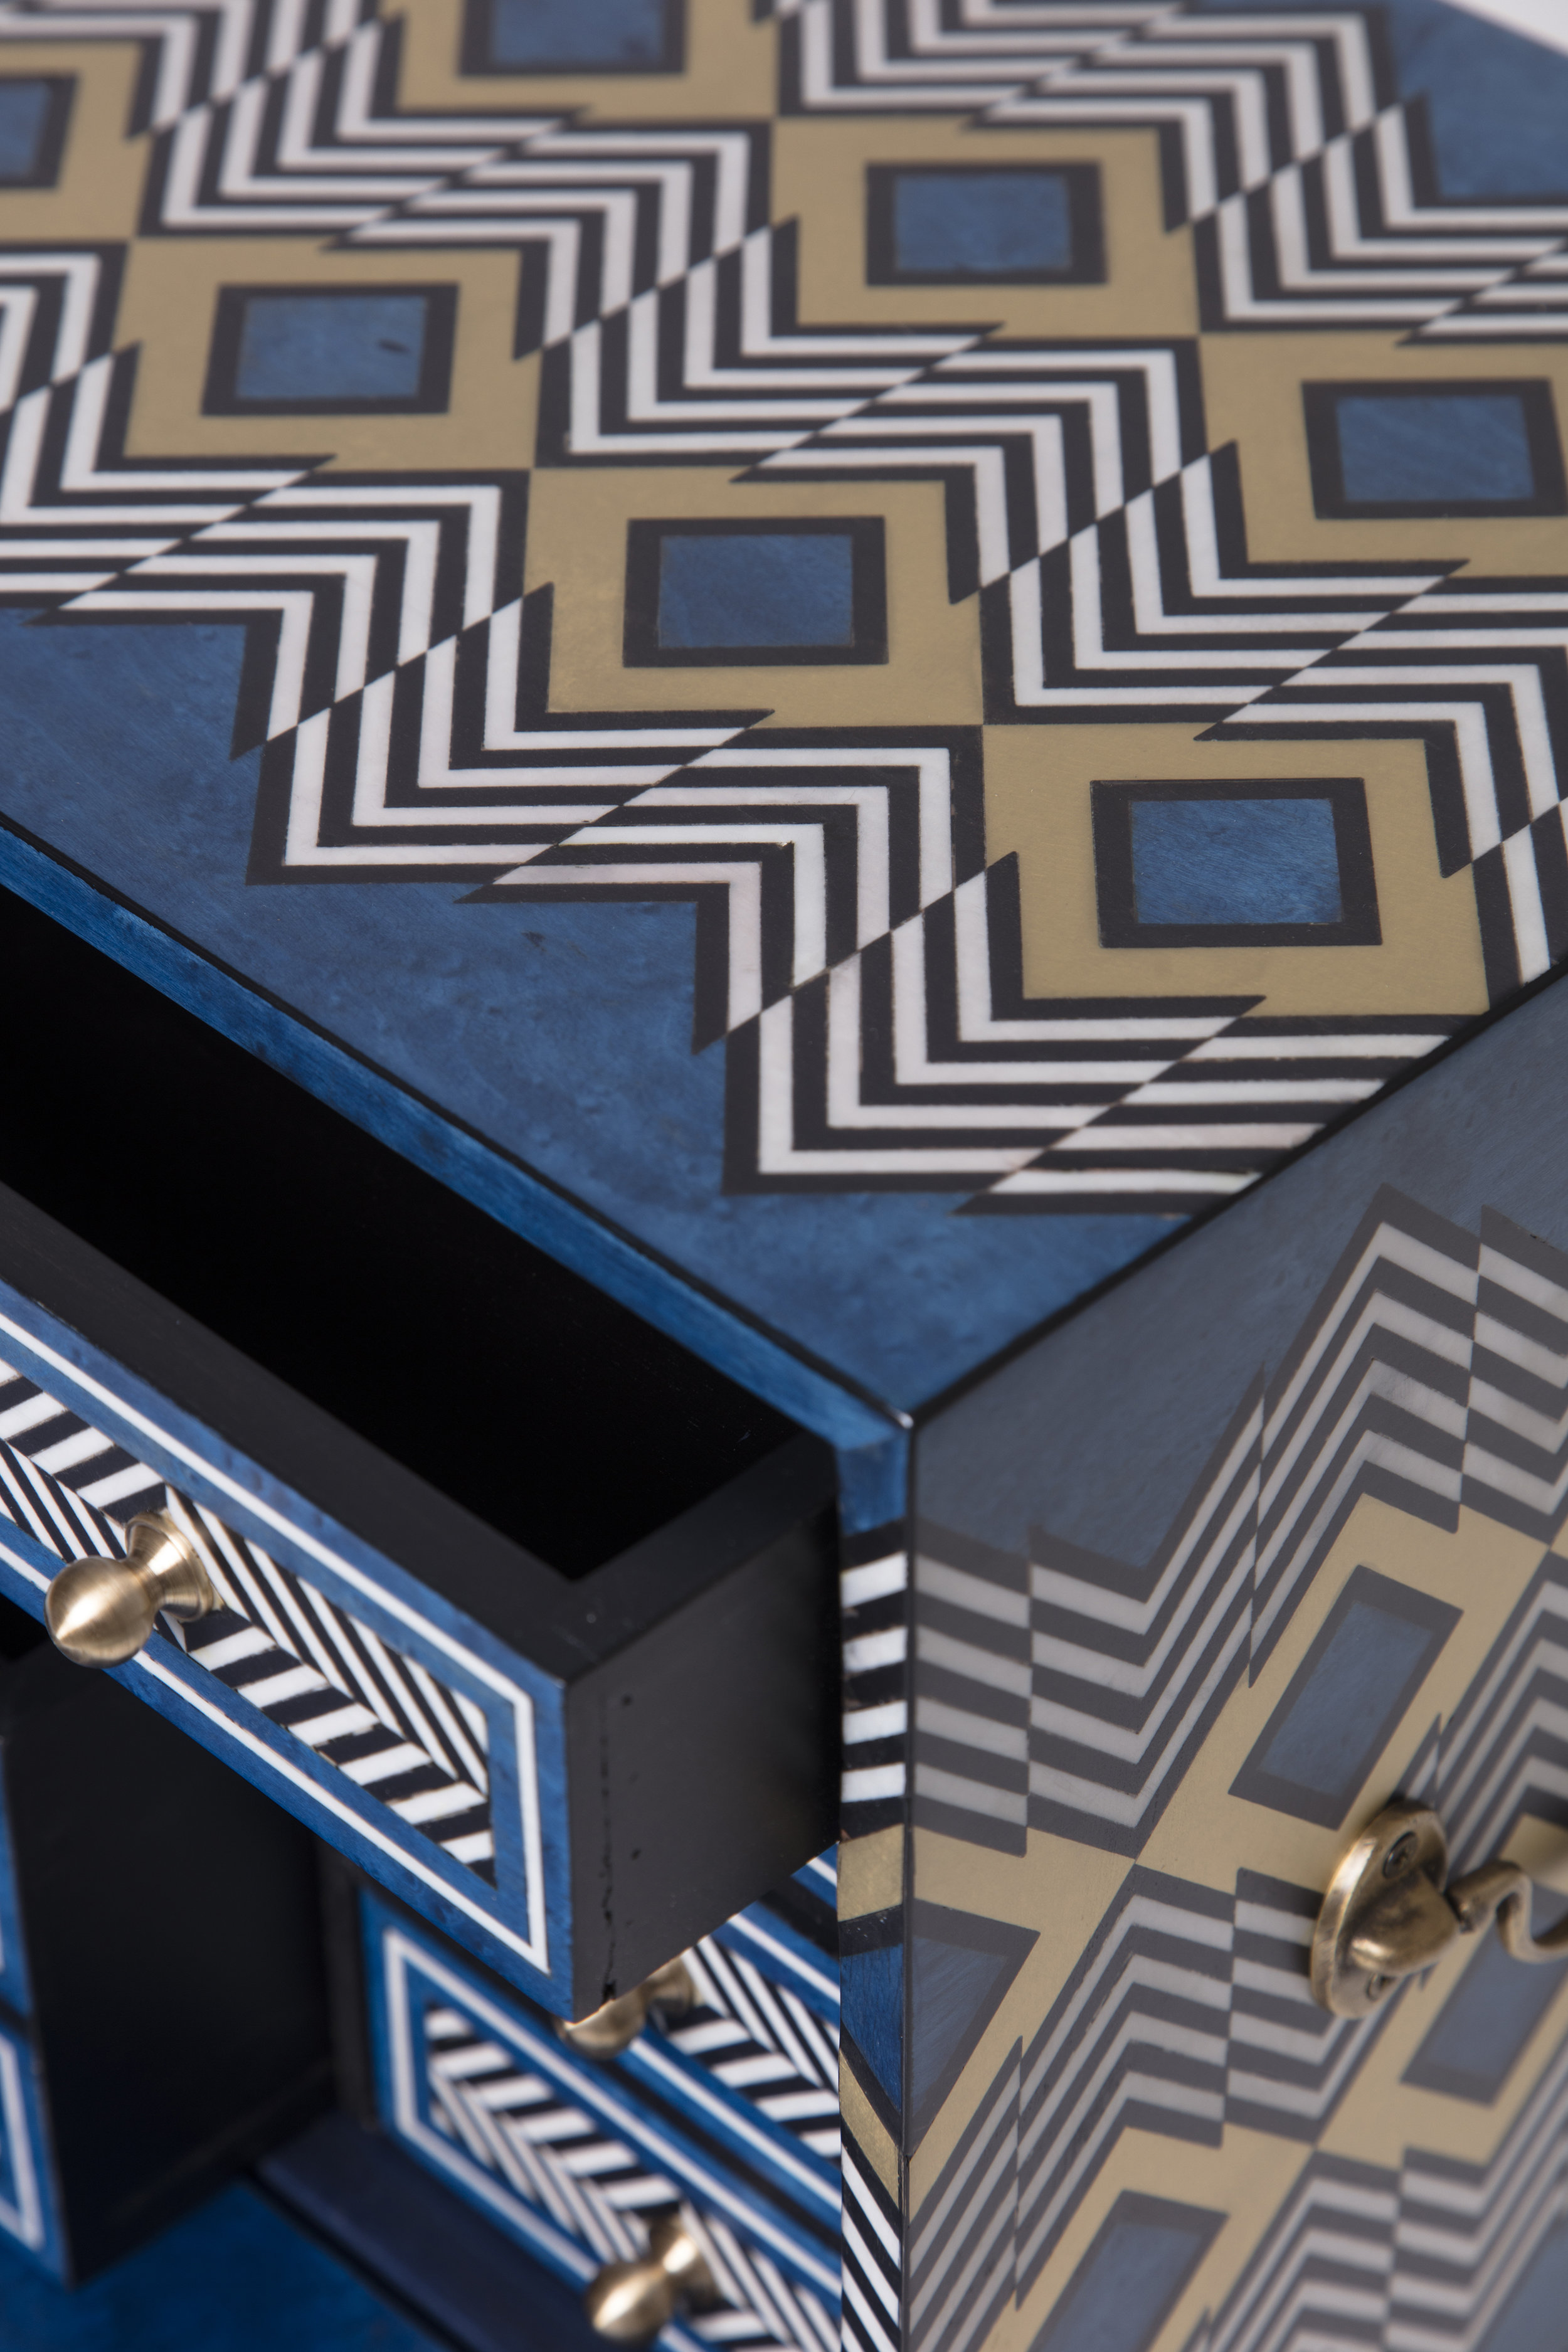 Sibylle Tarazi_Curiosity Cabinets_Twin Peaks Detail 2_2017.jpg